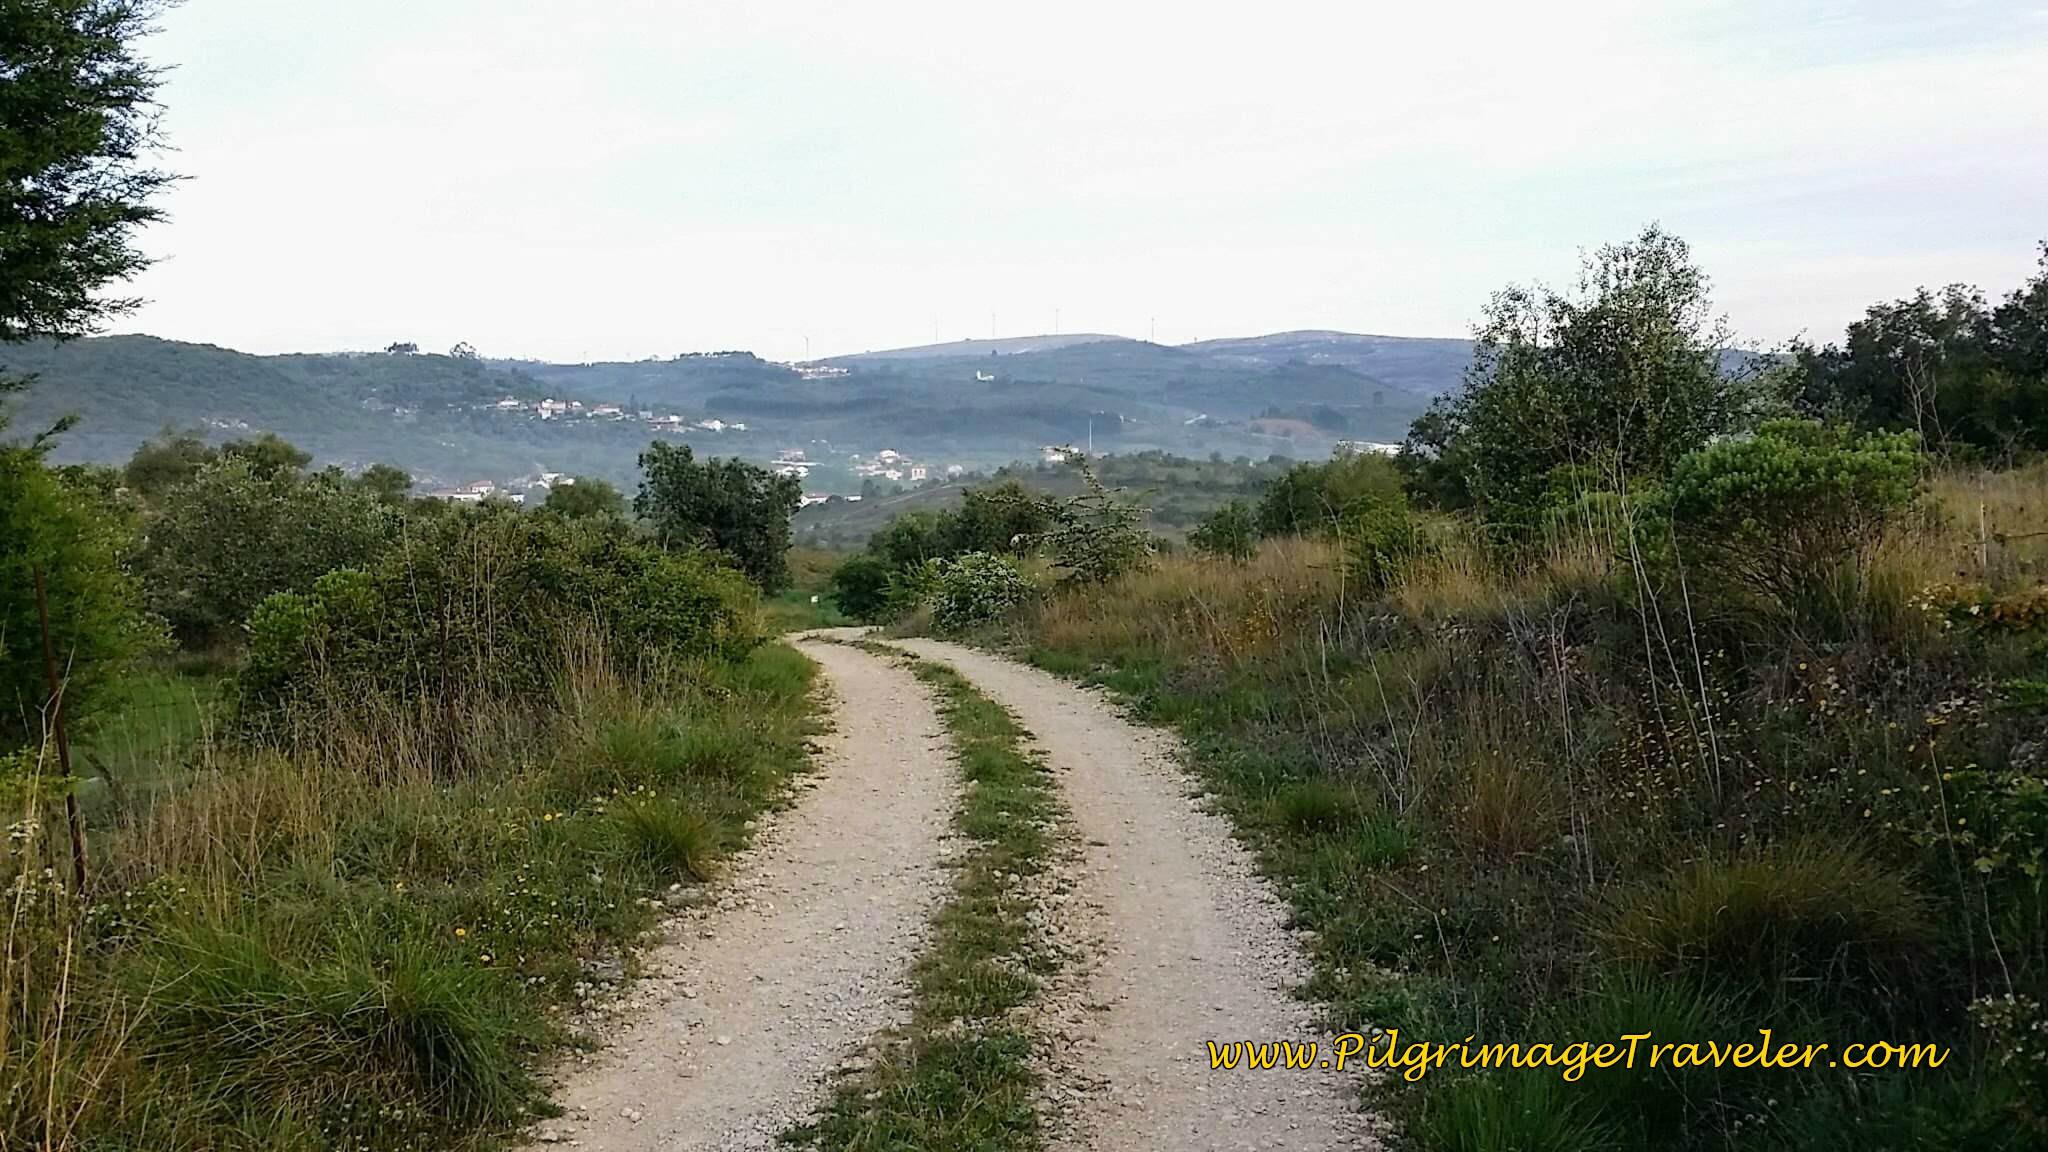 Onward Toward Ribera de Alcalamouque